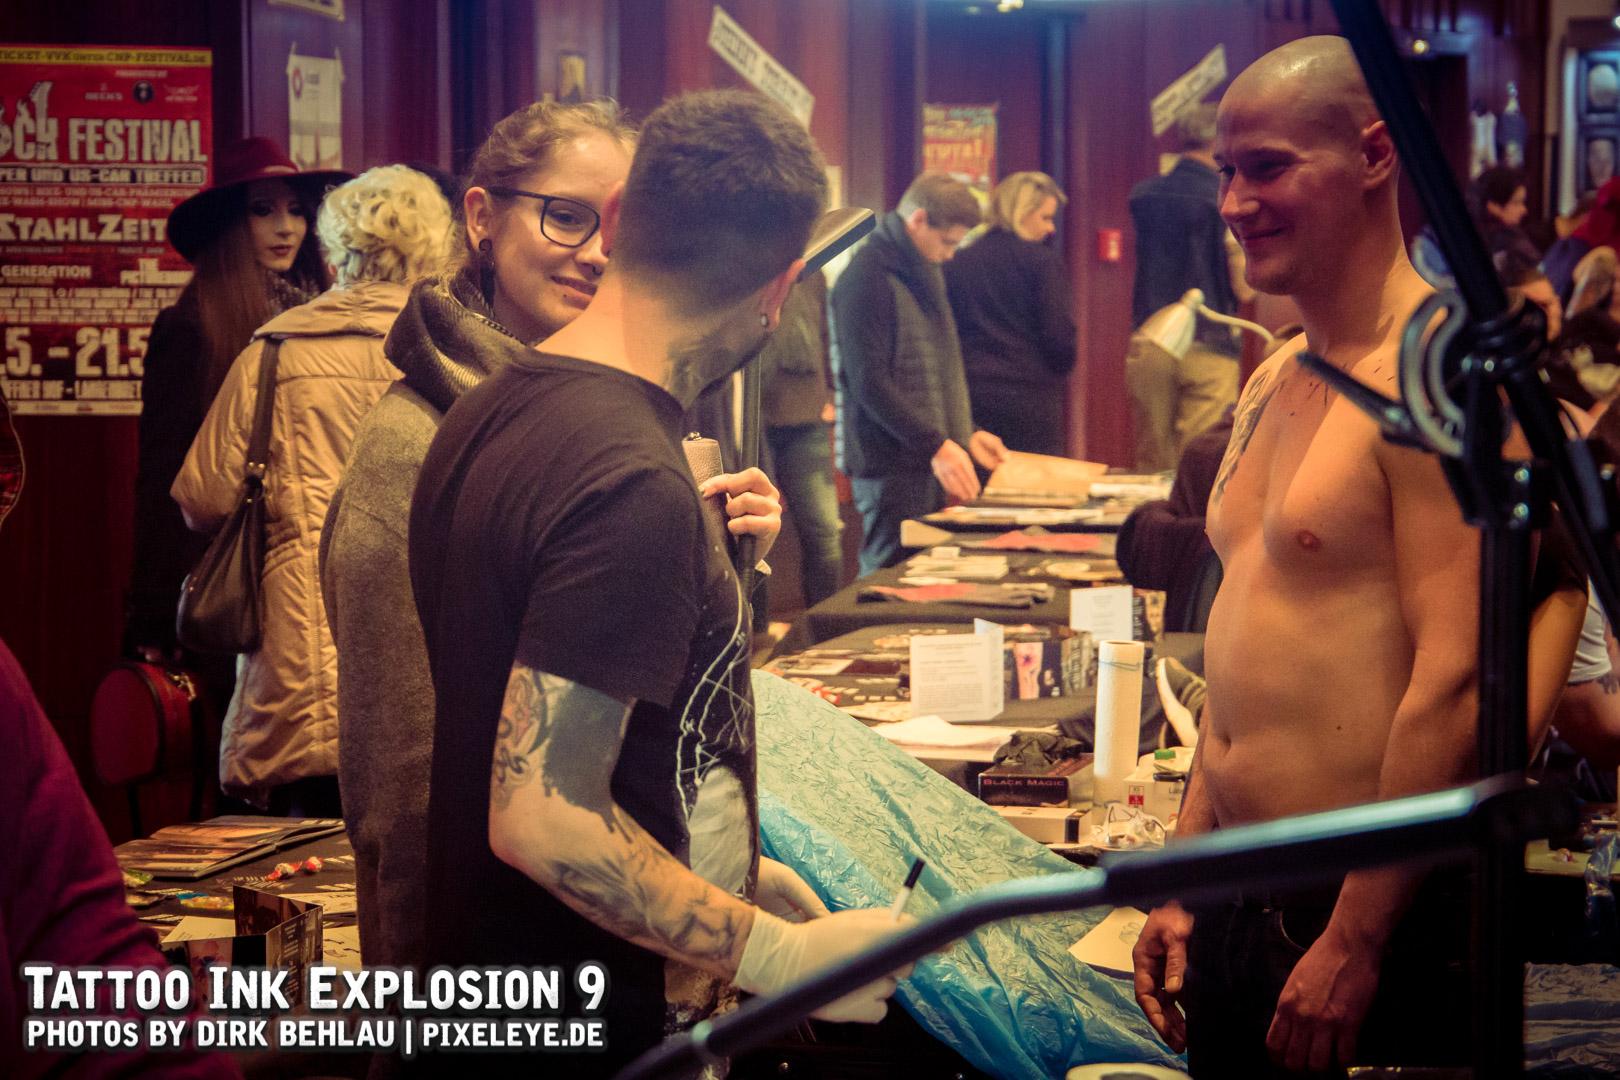 Tattoo Ink Explosion 2018 WEB by Dirk Behlau-0289.jpg